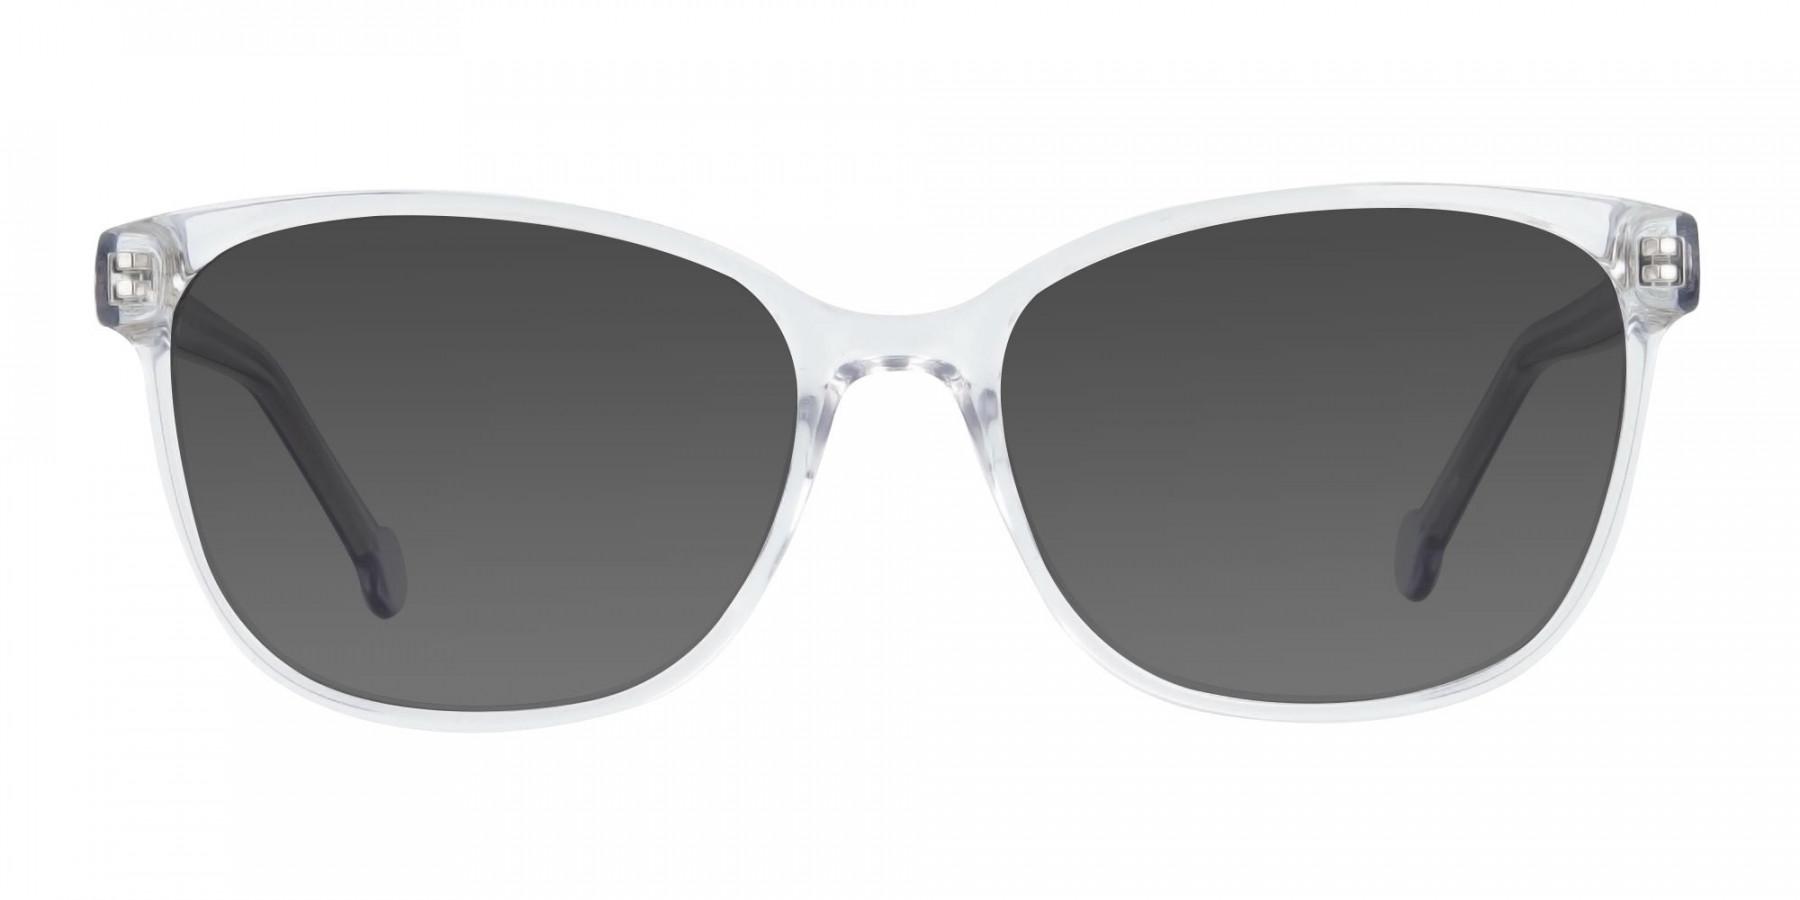 Crystal Clear Frame Sunglasses